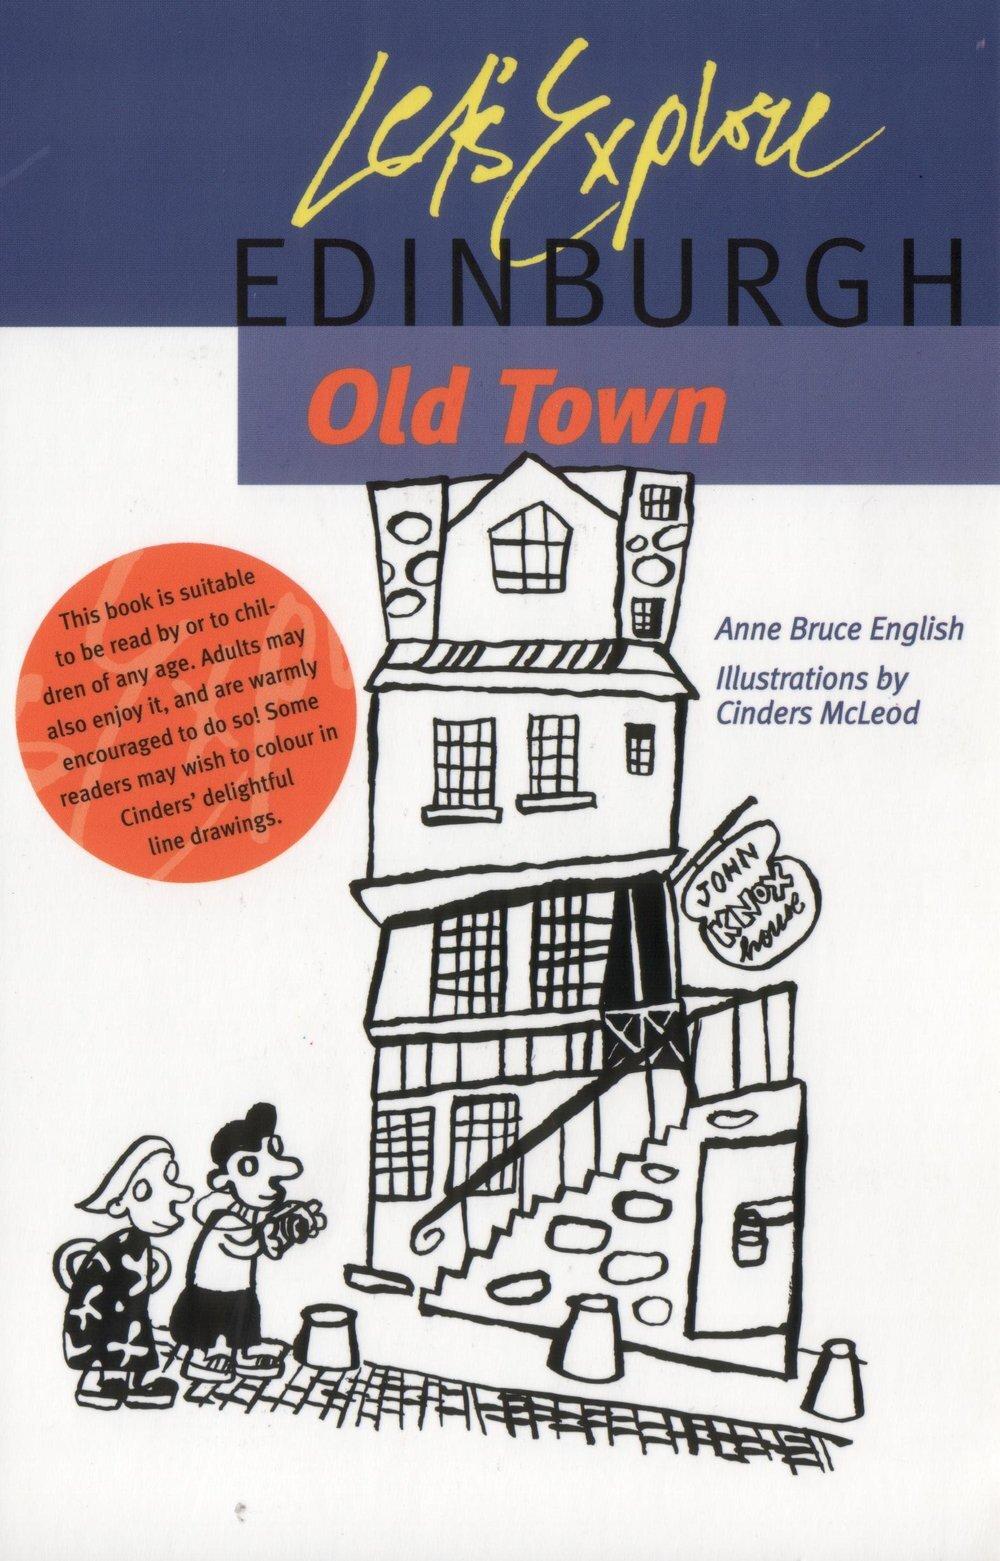 Let's+Explore+Edinburgh+Old+Town Luath Press.jpg